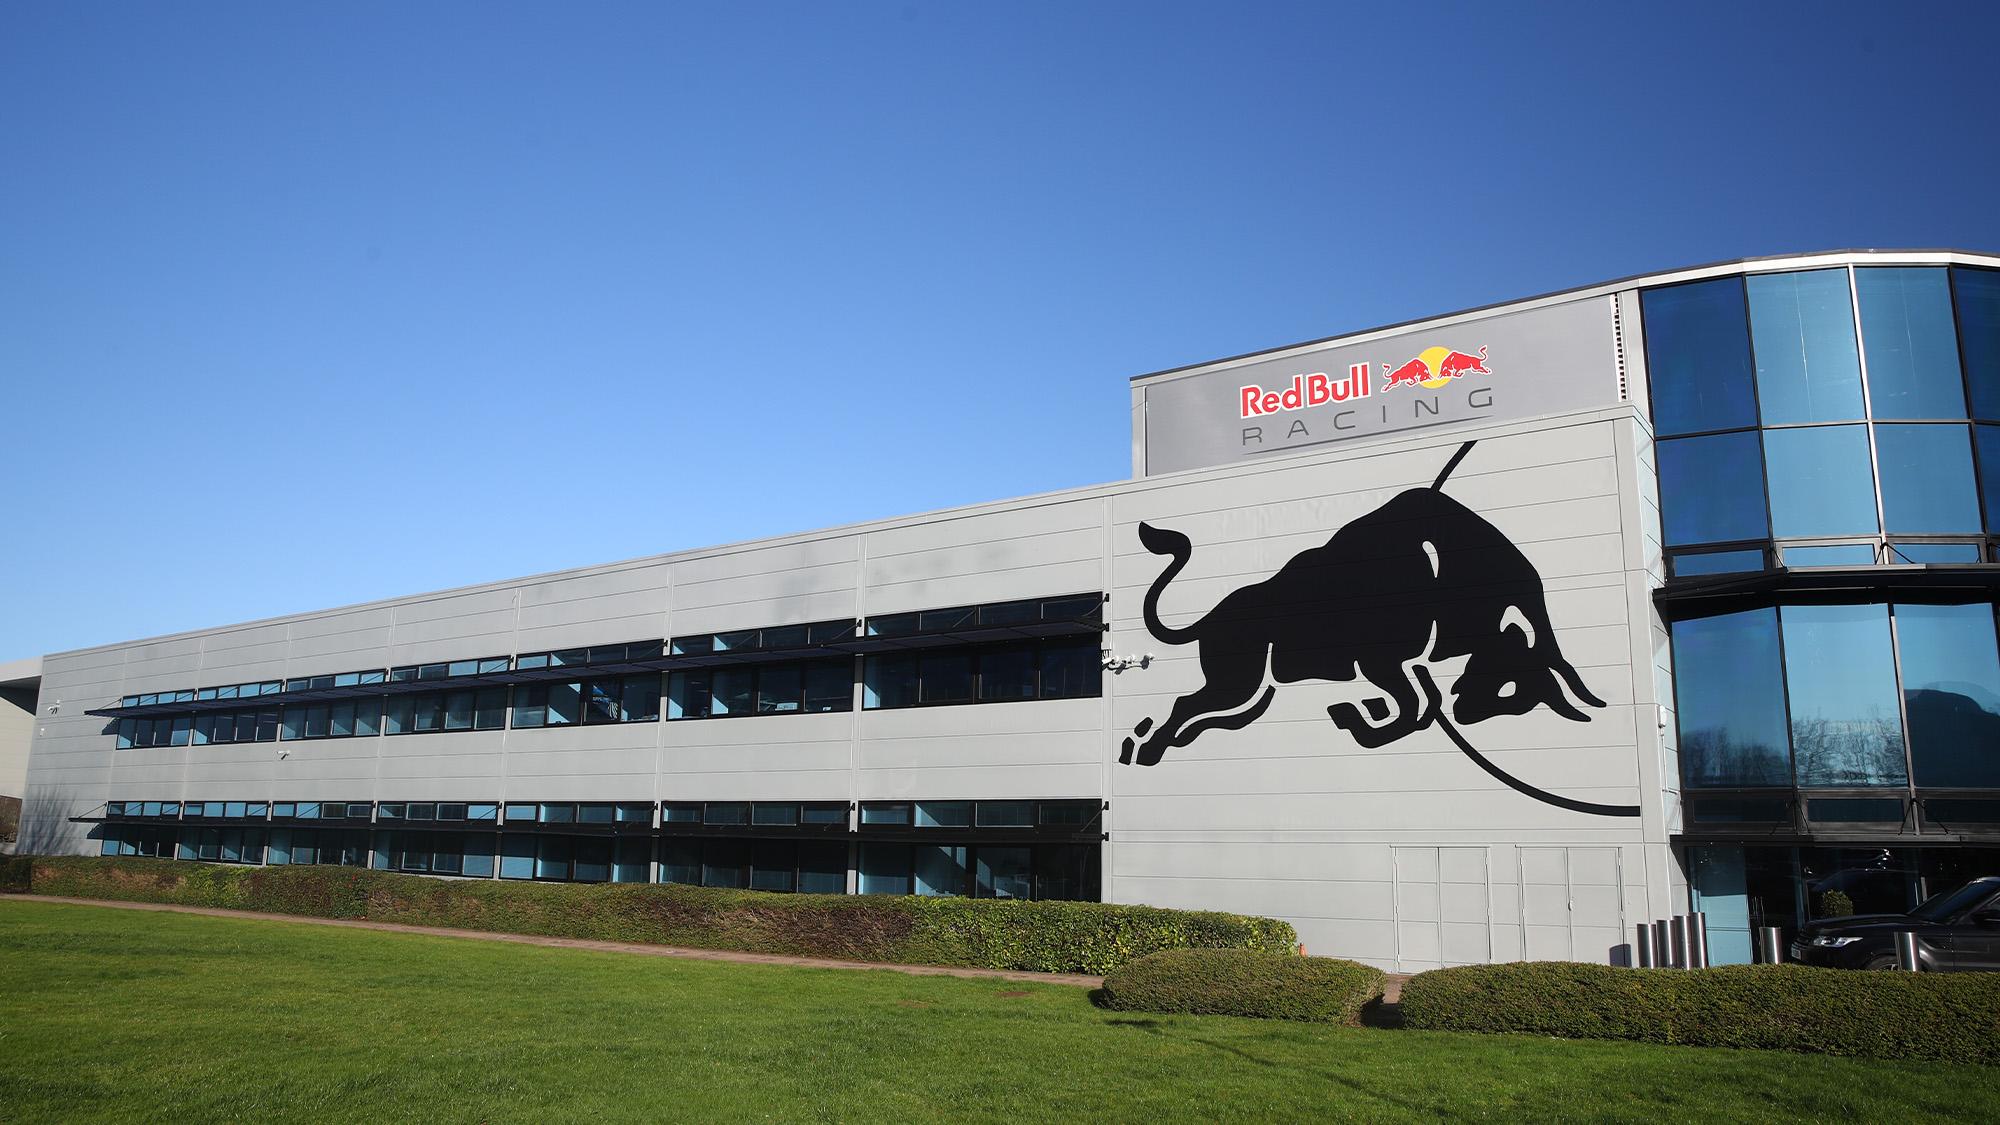 Red Bull Racing factory MIlton Keynes